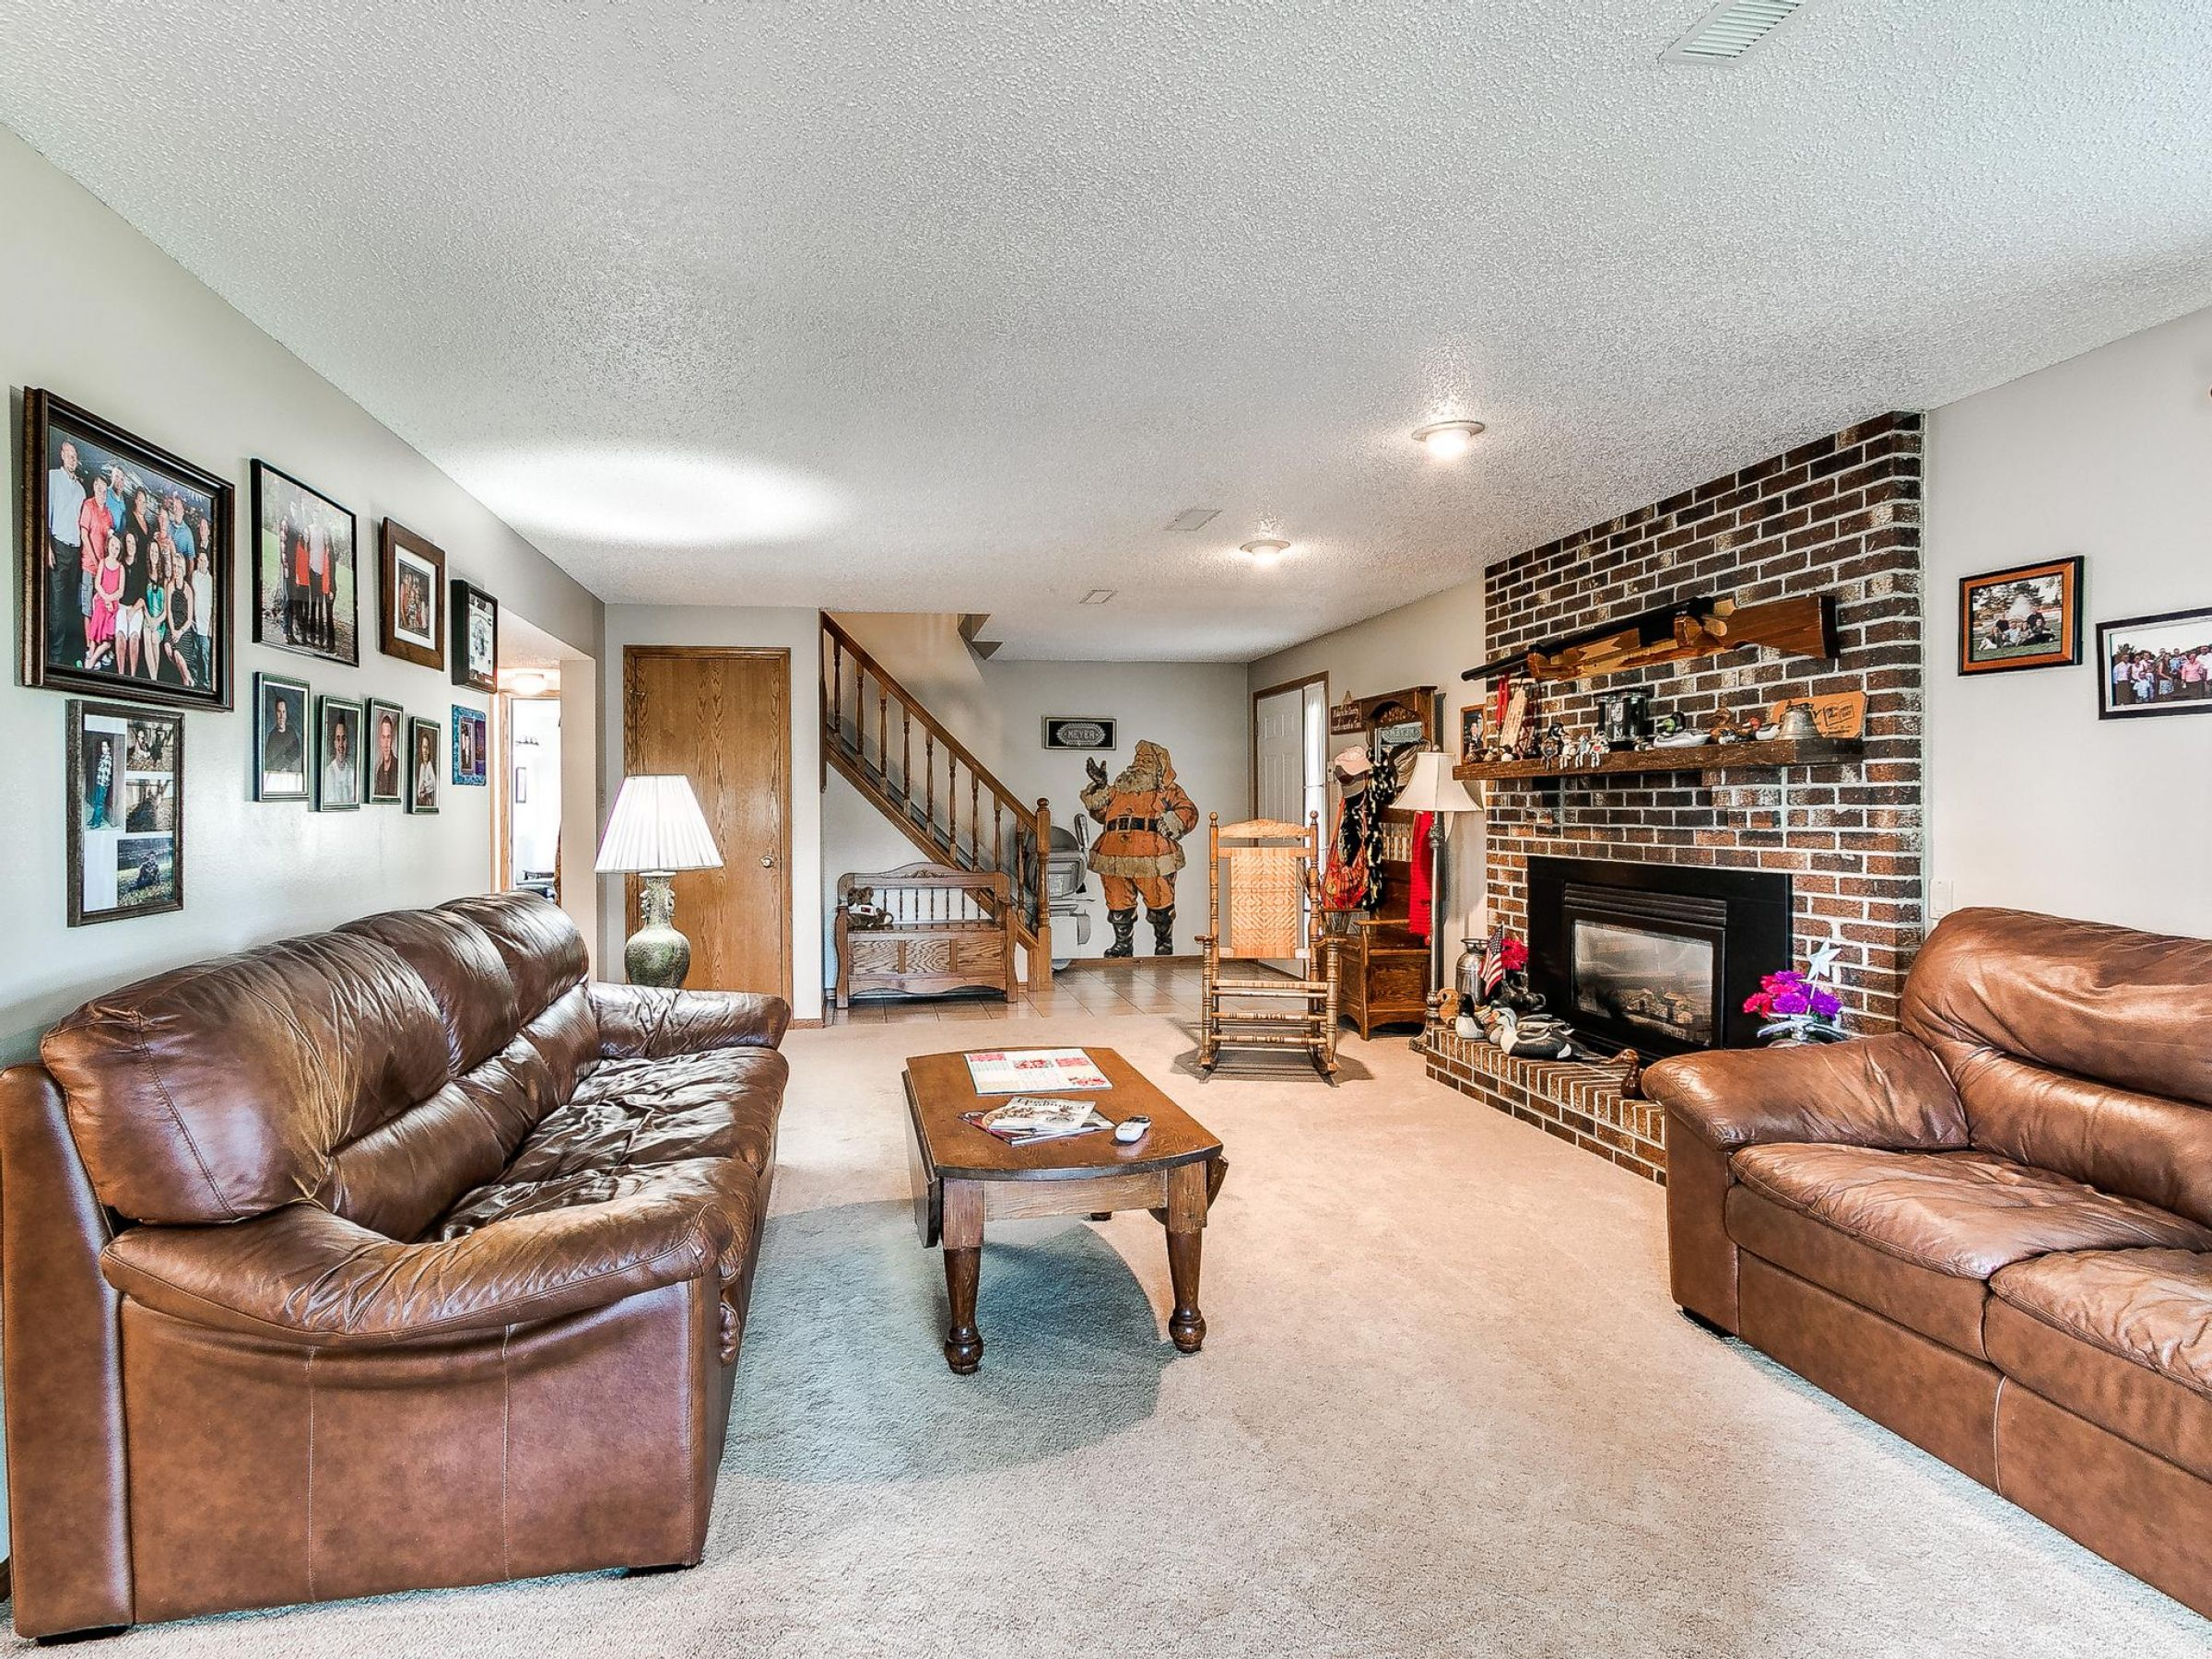 residential-warren-county-iowa-3-acres-listing-number-15593-1-2021-06-18-155238.jpg